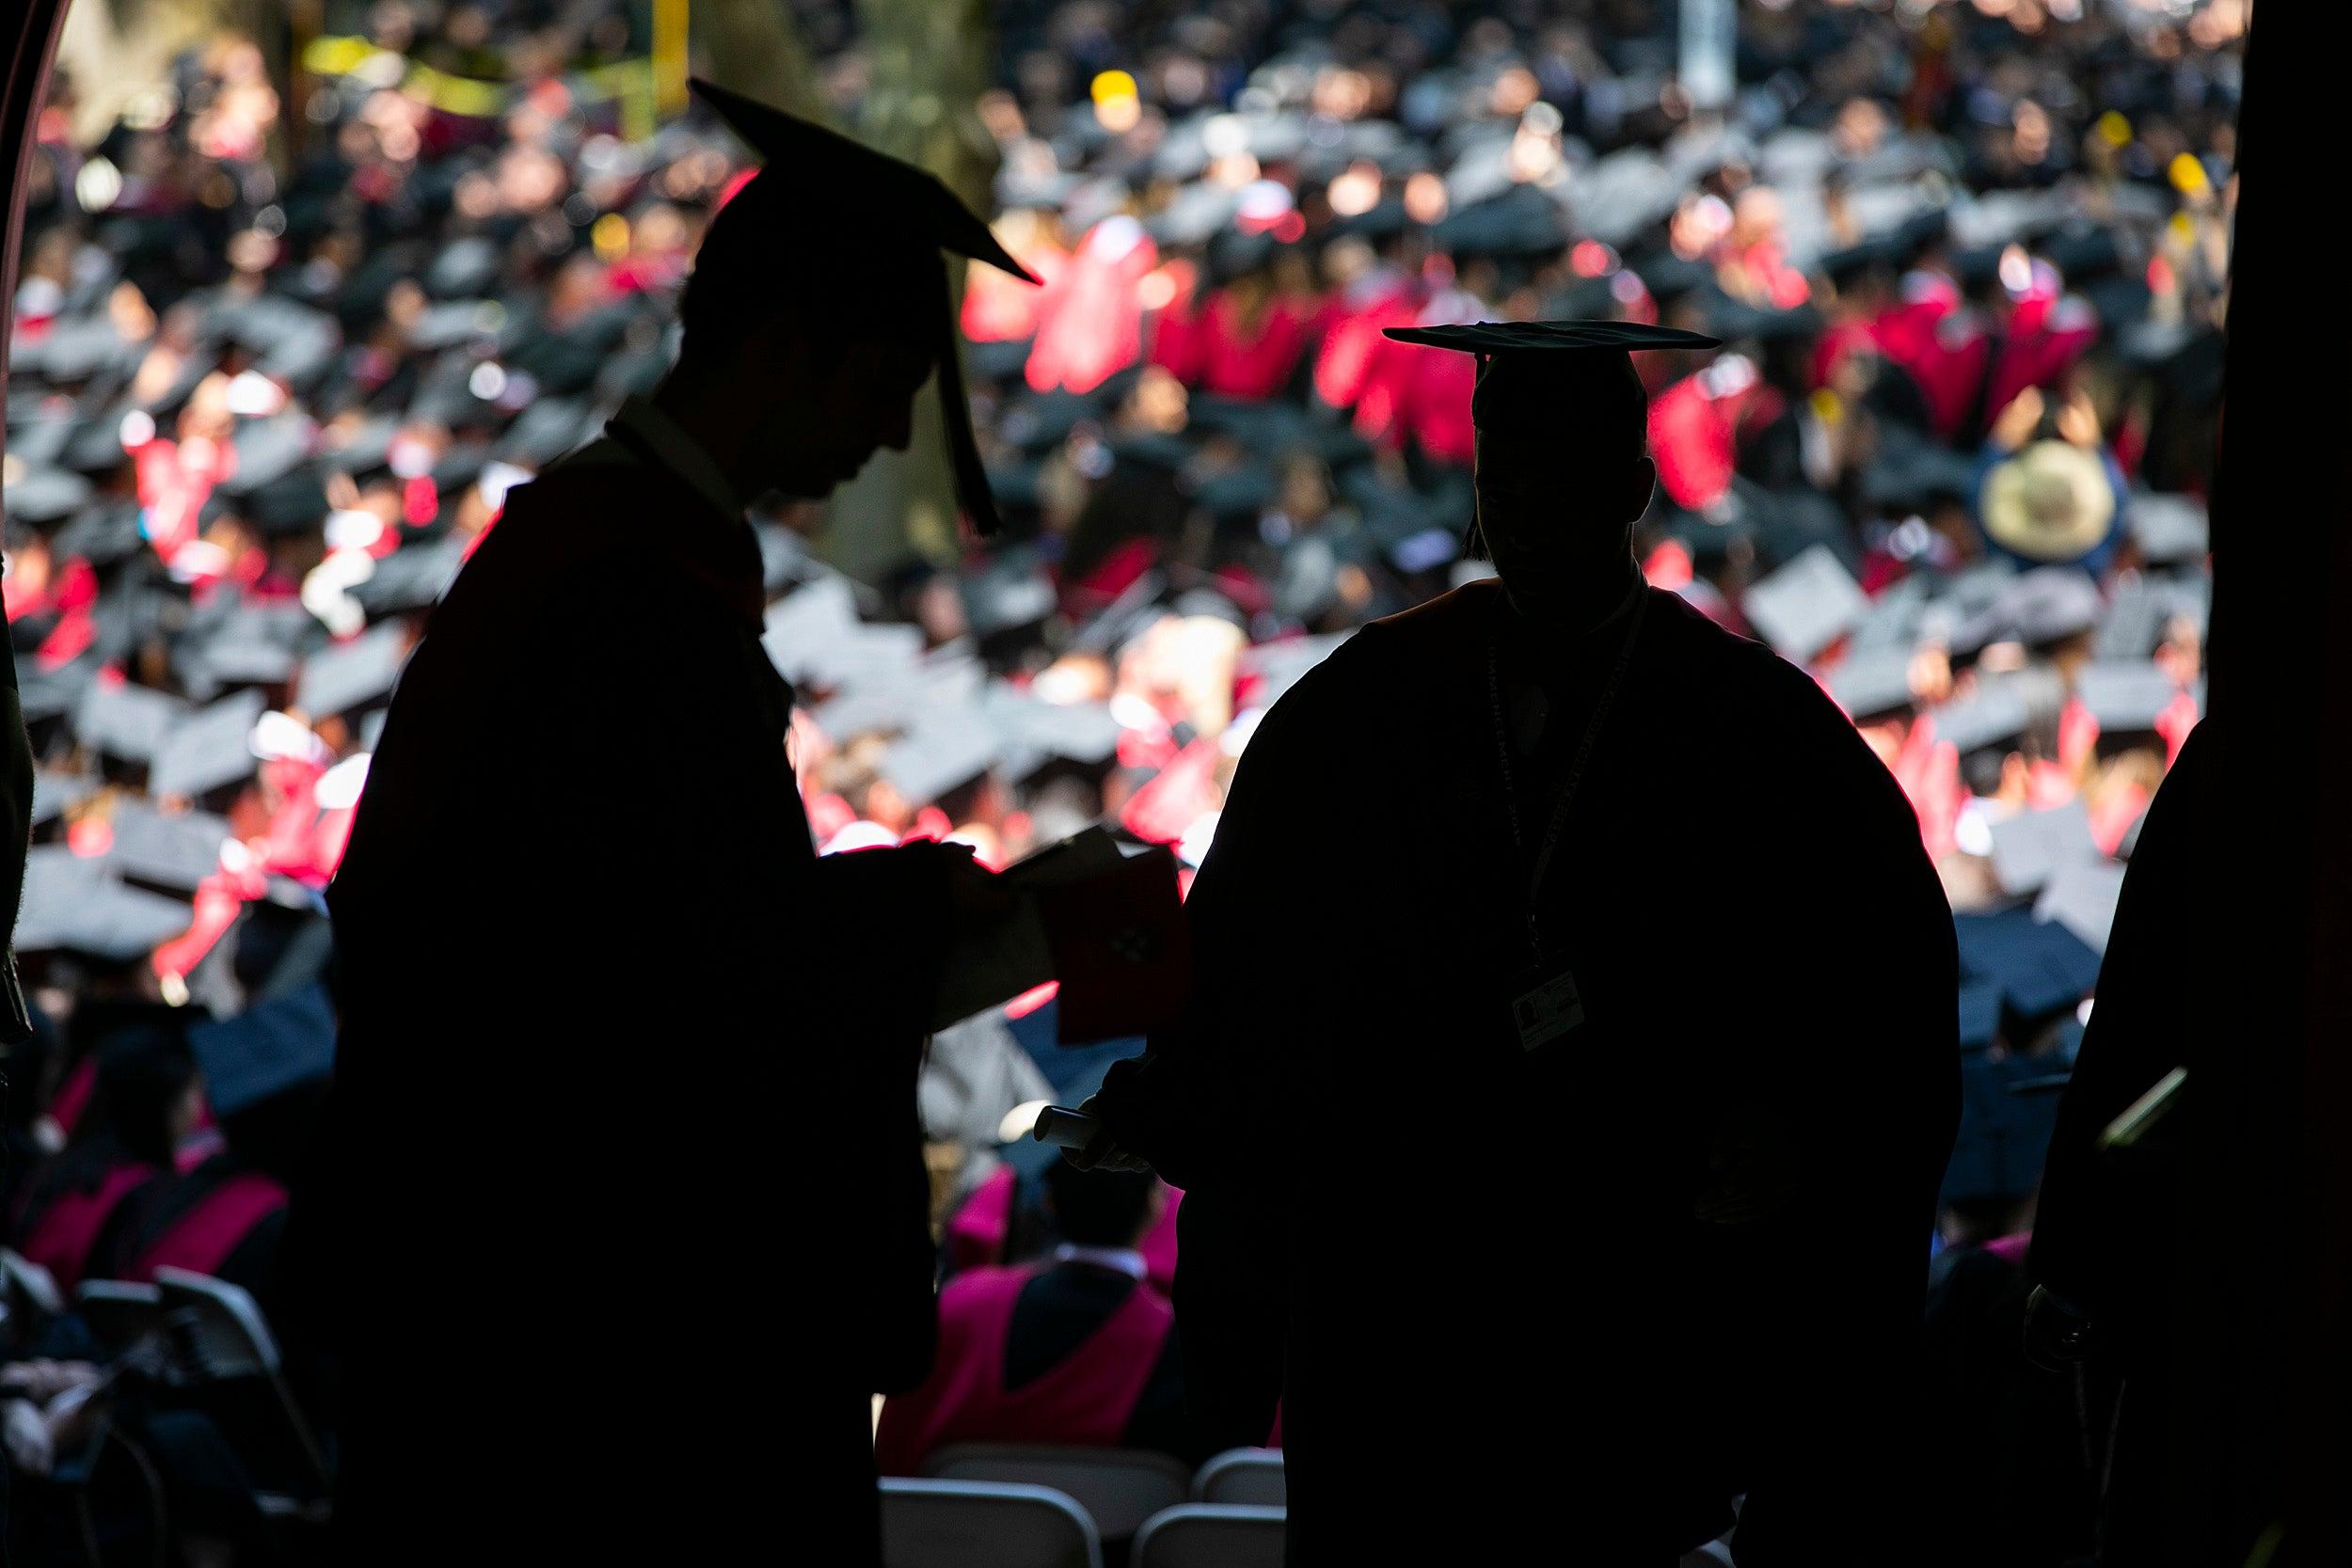 Graduates in silhouette.